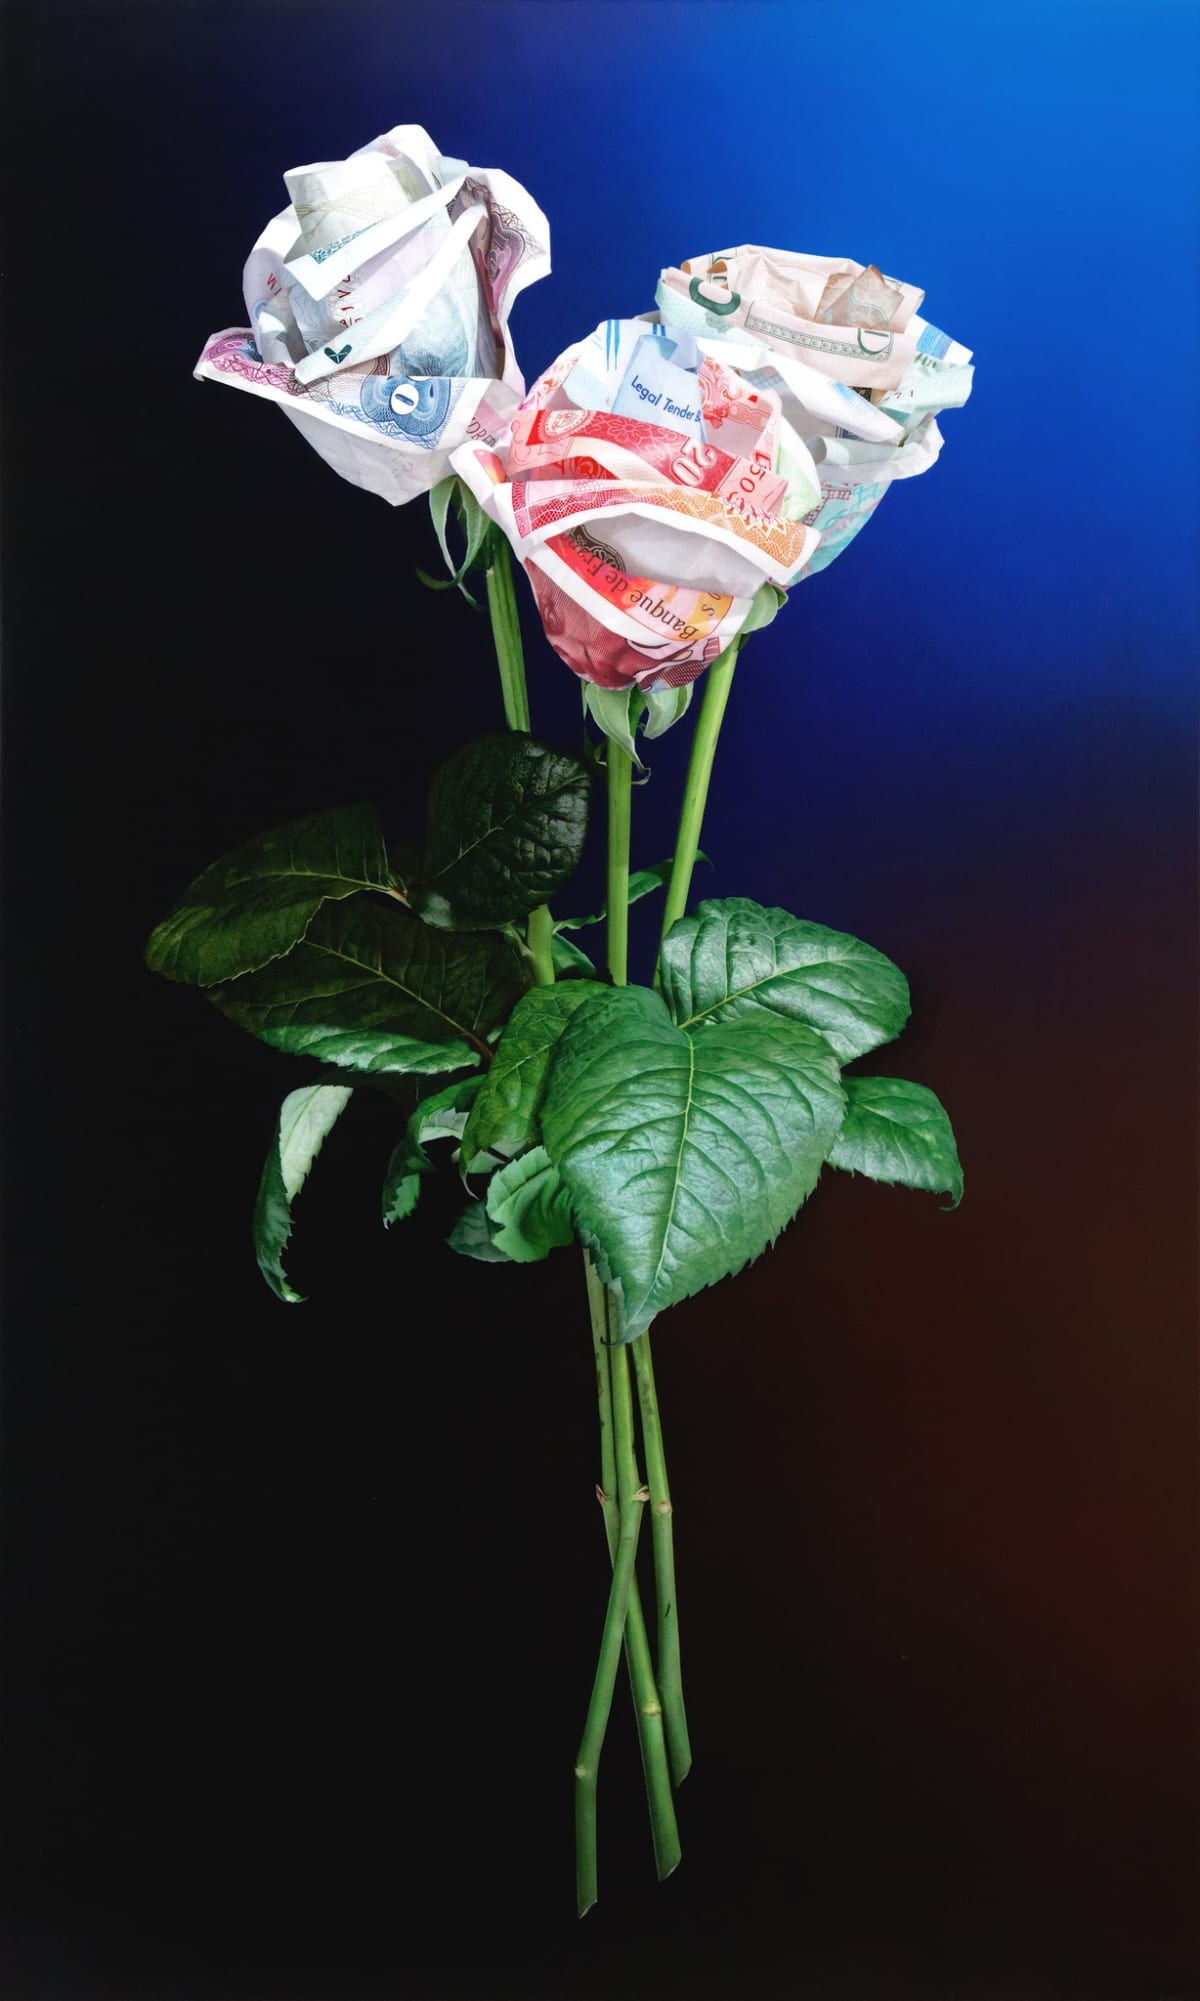 Tom Martin Buy Me Love Acrylic on aluminium composite panel 90 x 150 cm